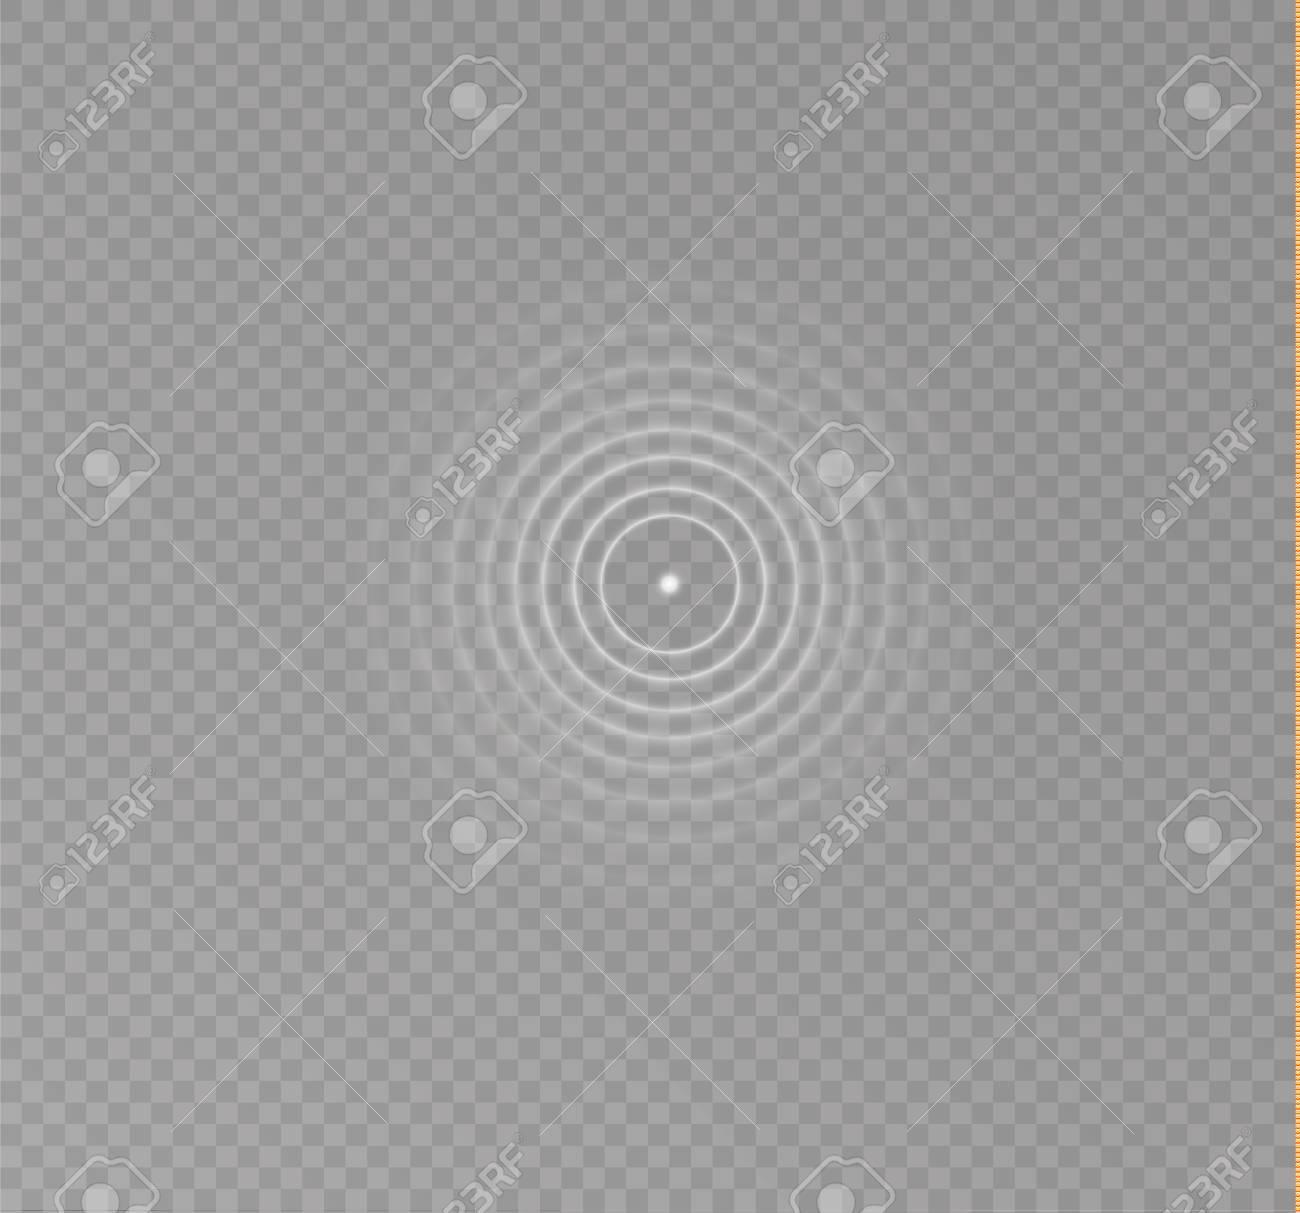 Red Radio Waves Clip Art At Clker Com Vector Clip Art - Clip Art - Free  Transparent PNG Download - PNGkey